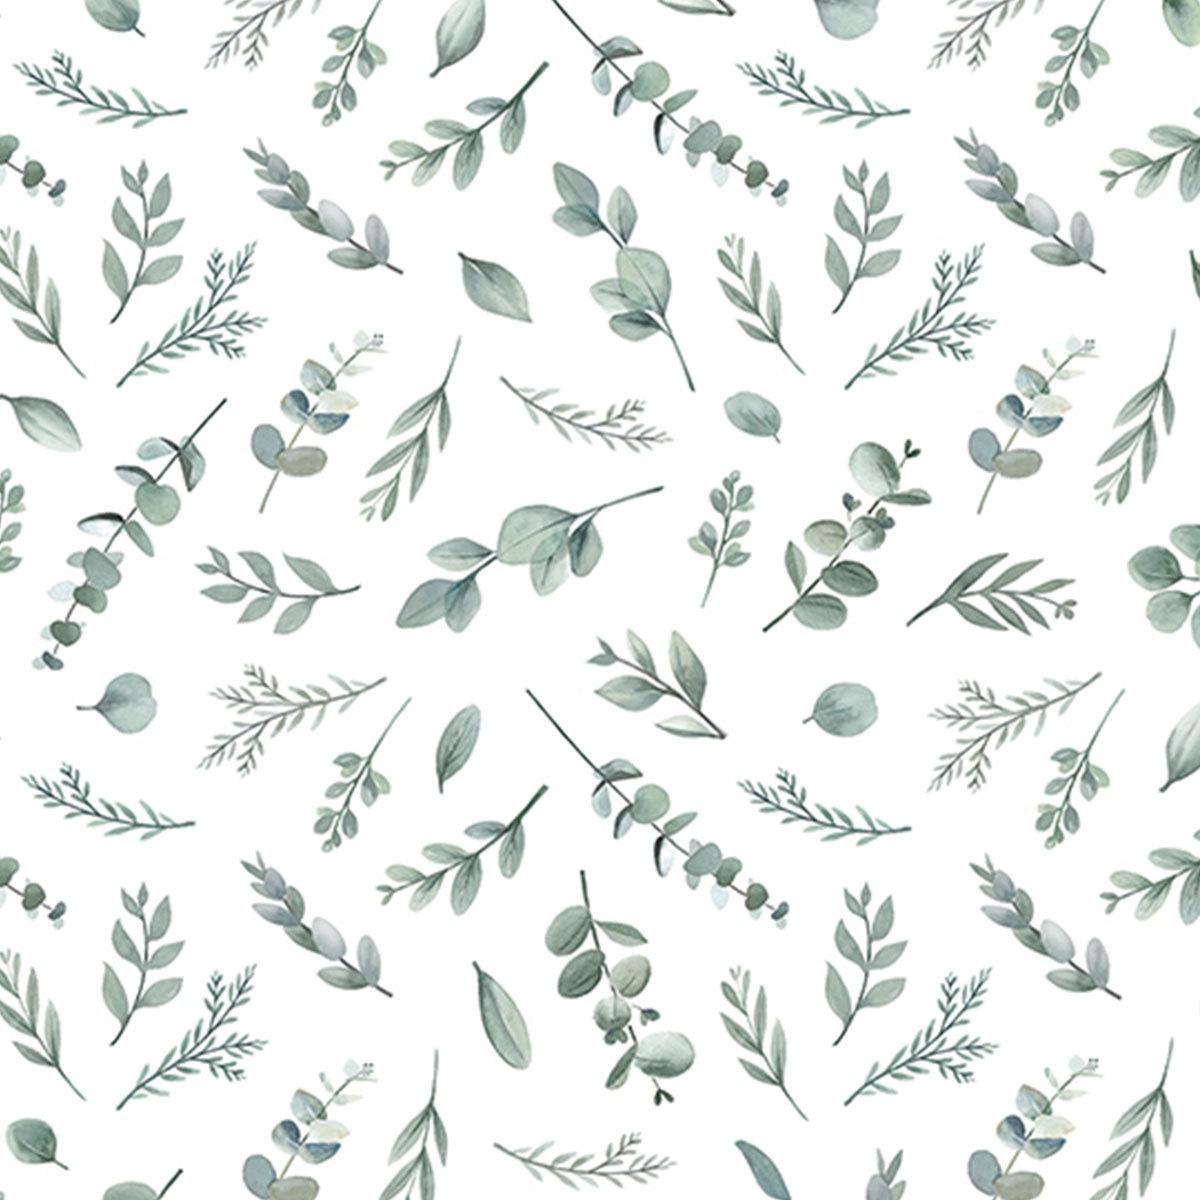 Papier peint Papier Peint - Eucalyptus Papier Peint - Eucalyptus